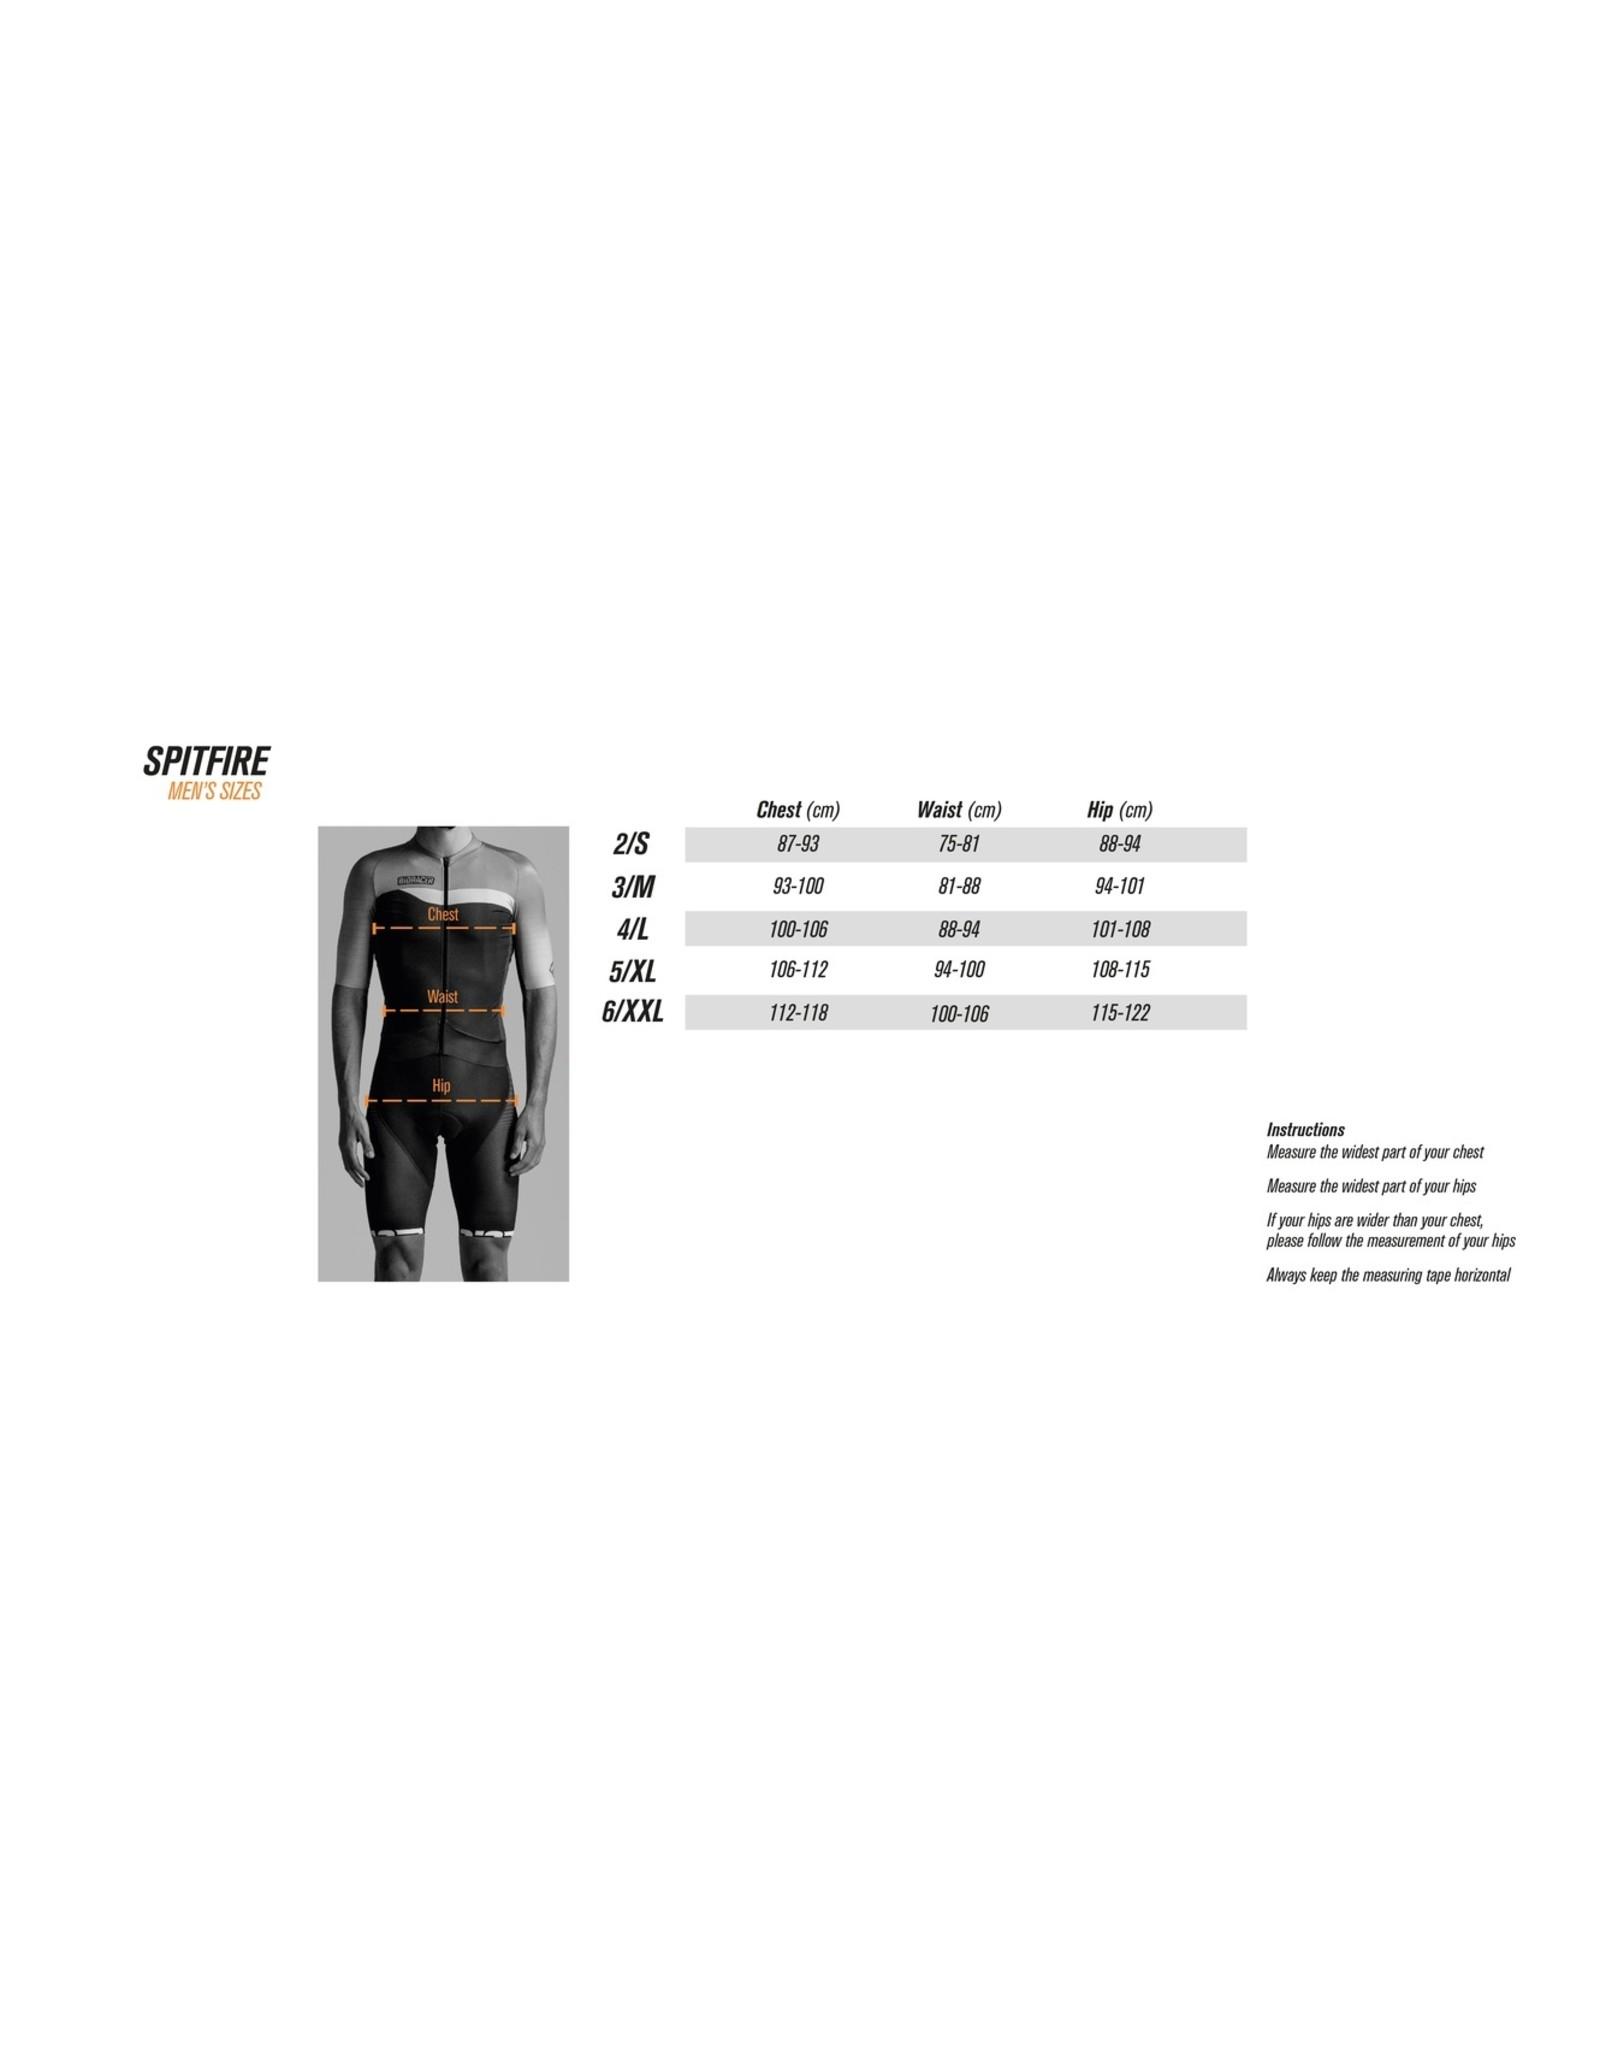 Bioracer '21, BIORACER, Netherlands Bodyfit SS Jersey